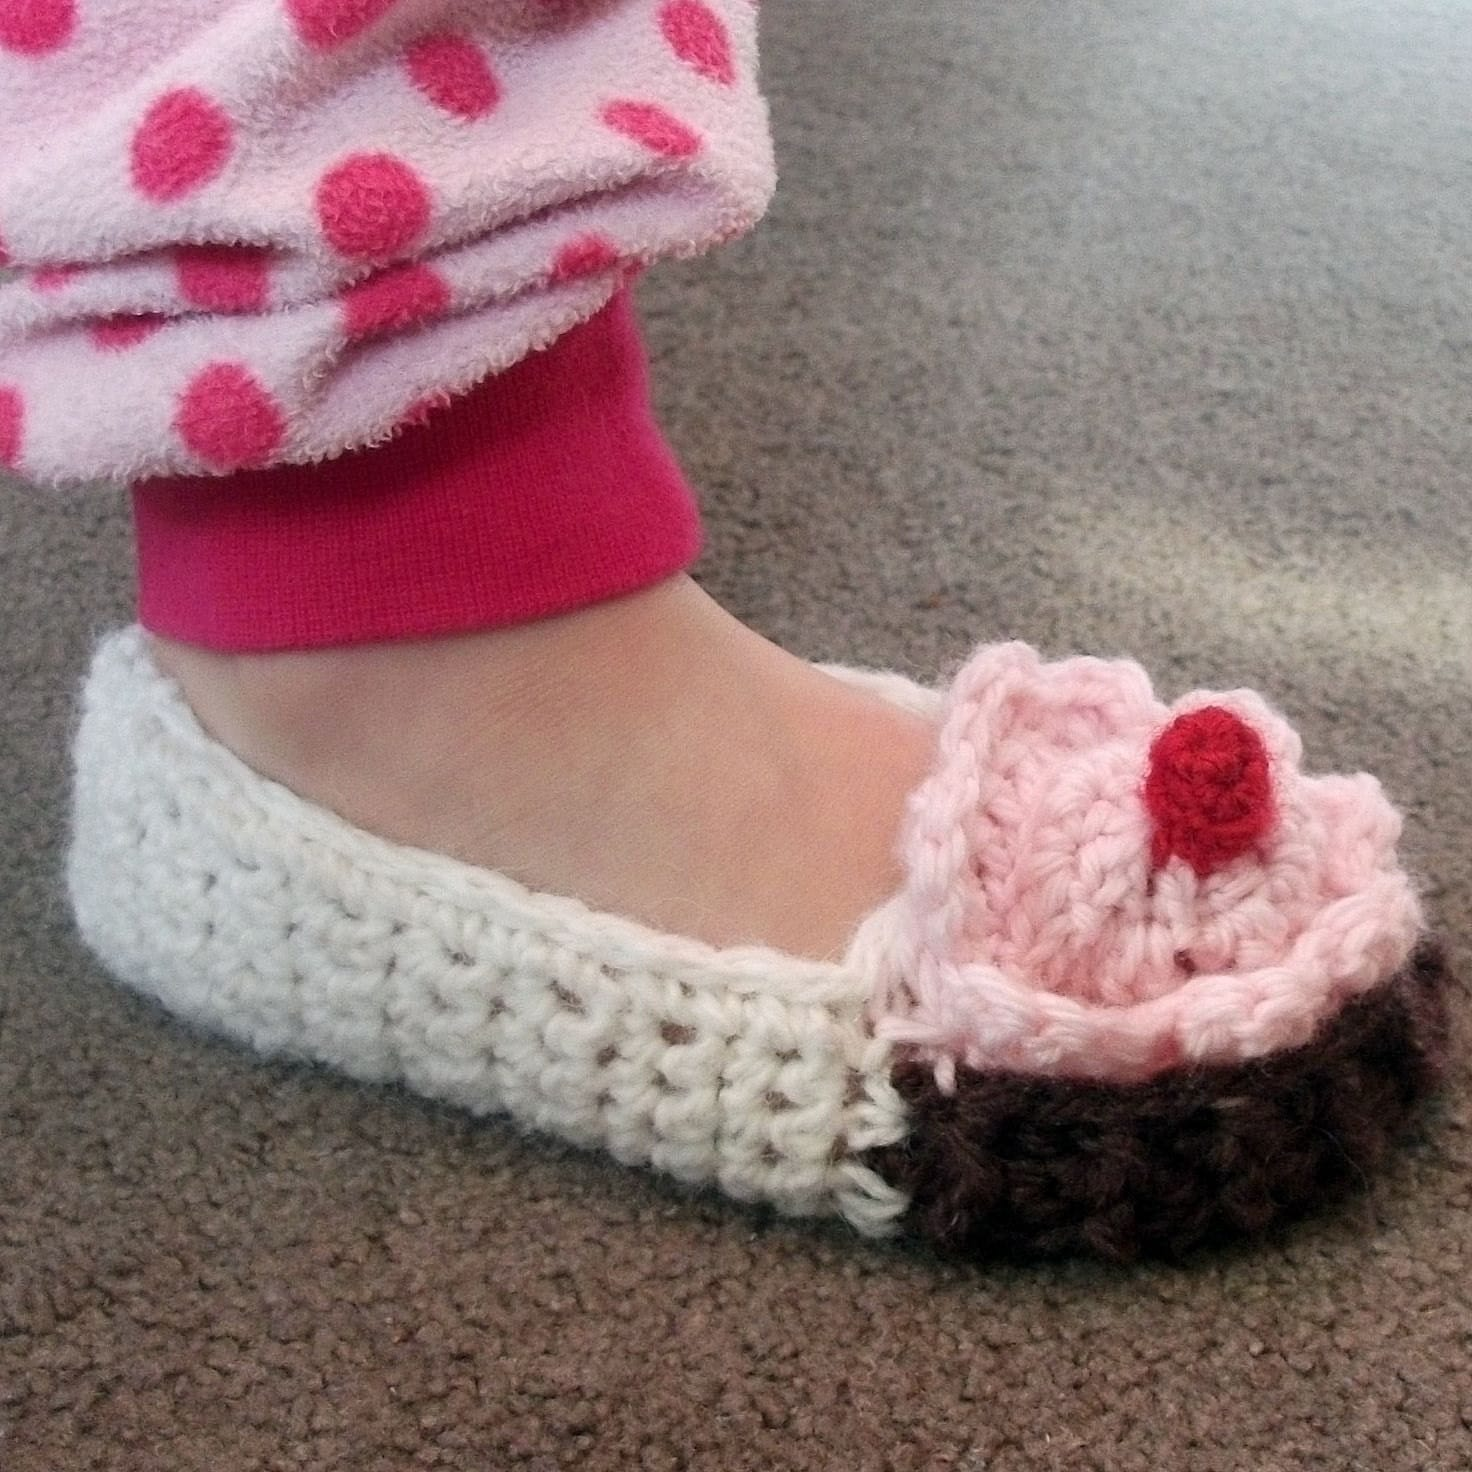 Crochet Patterns For Toddlers Slippers : CROCHET BABY SLIPPERS PATTERN ? Crochet For Beginners